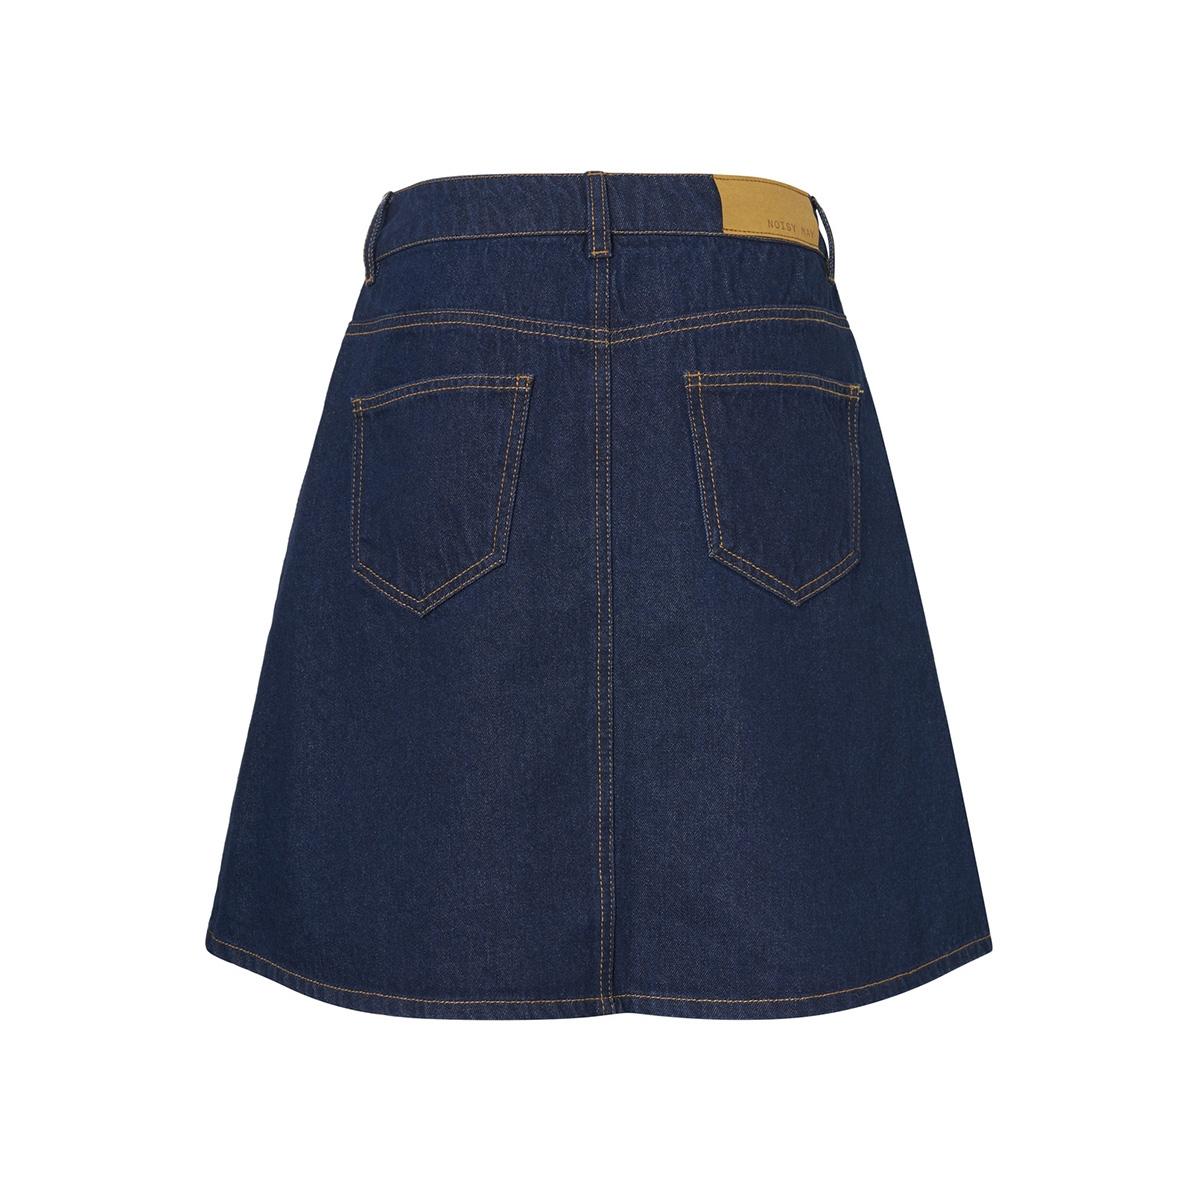 nmsunny shortdnm skater skirt gu027 27006862 noisy may rok dark blue denim